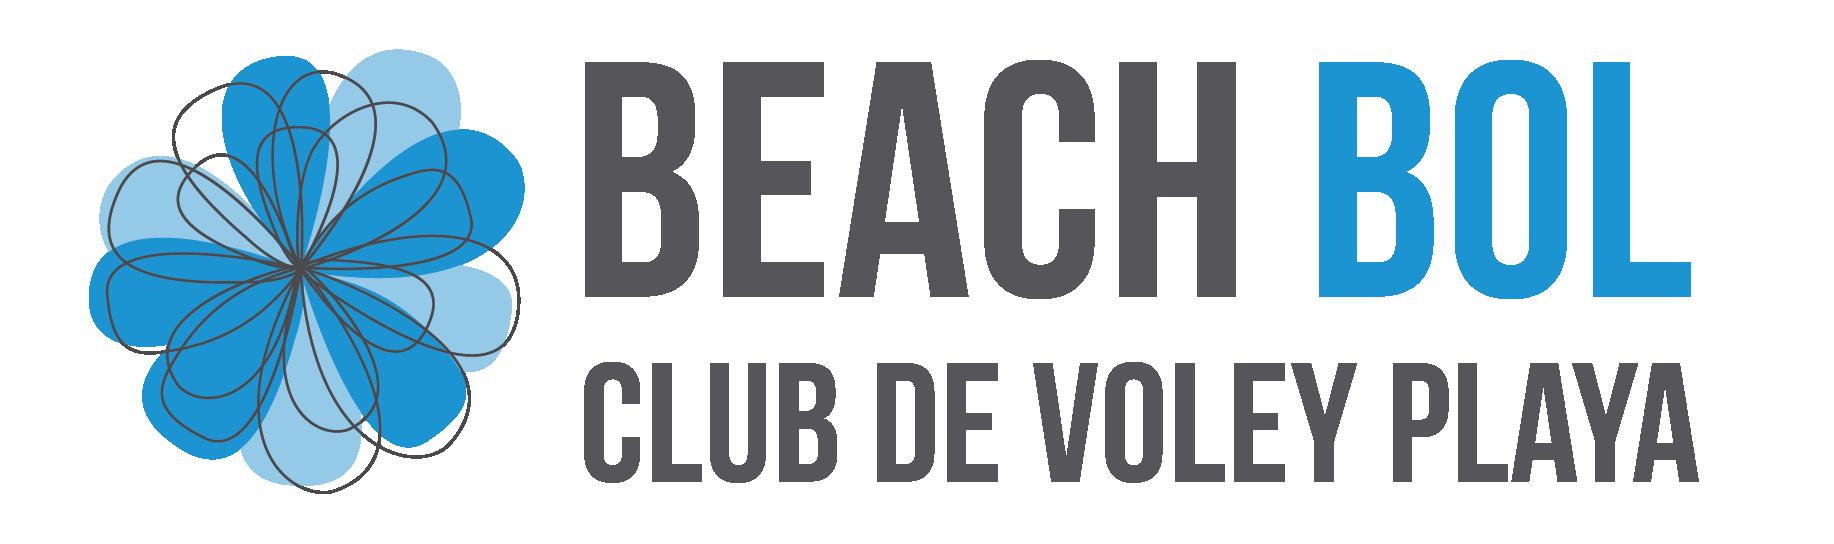 BEACHBOL logo